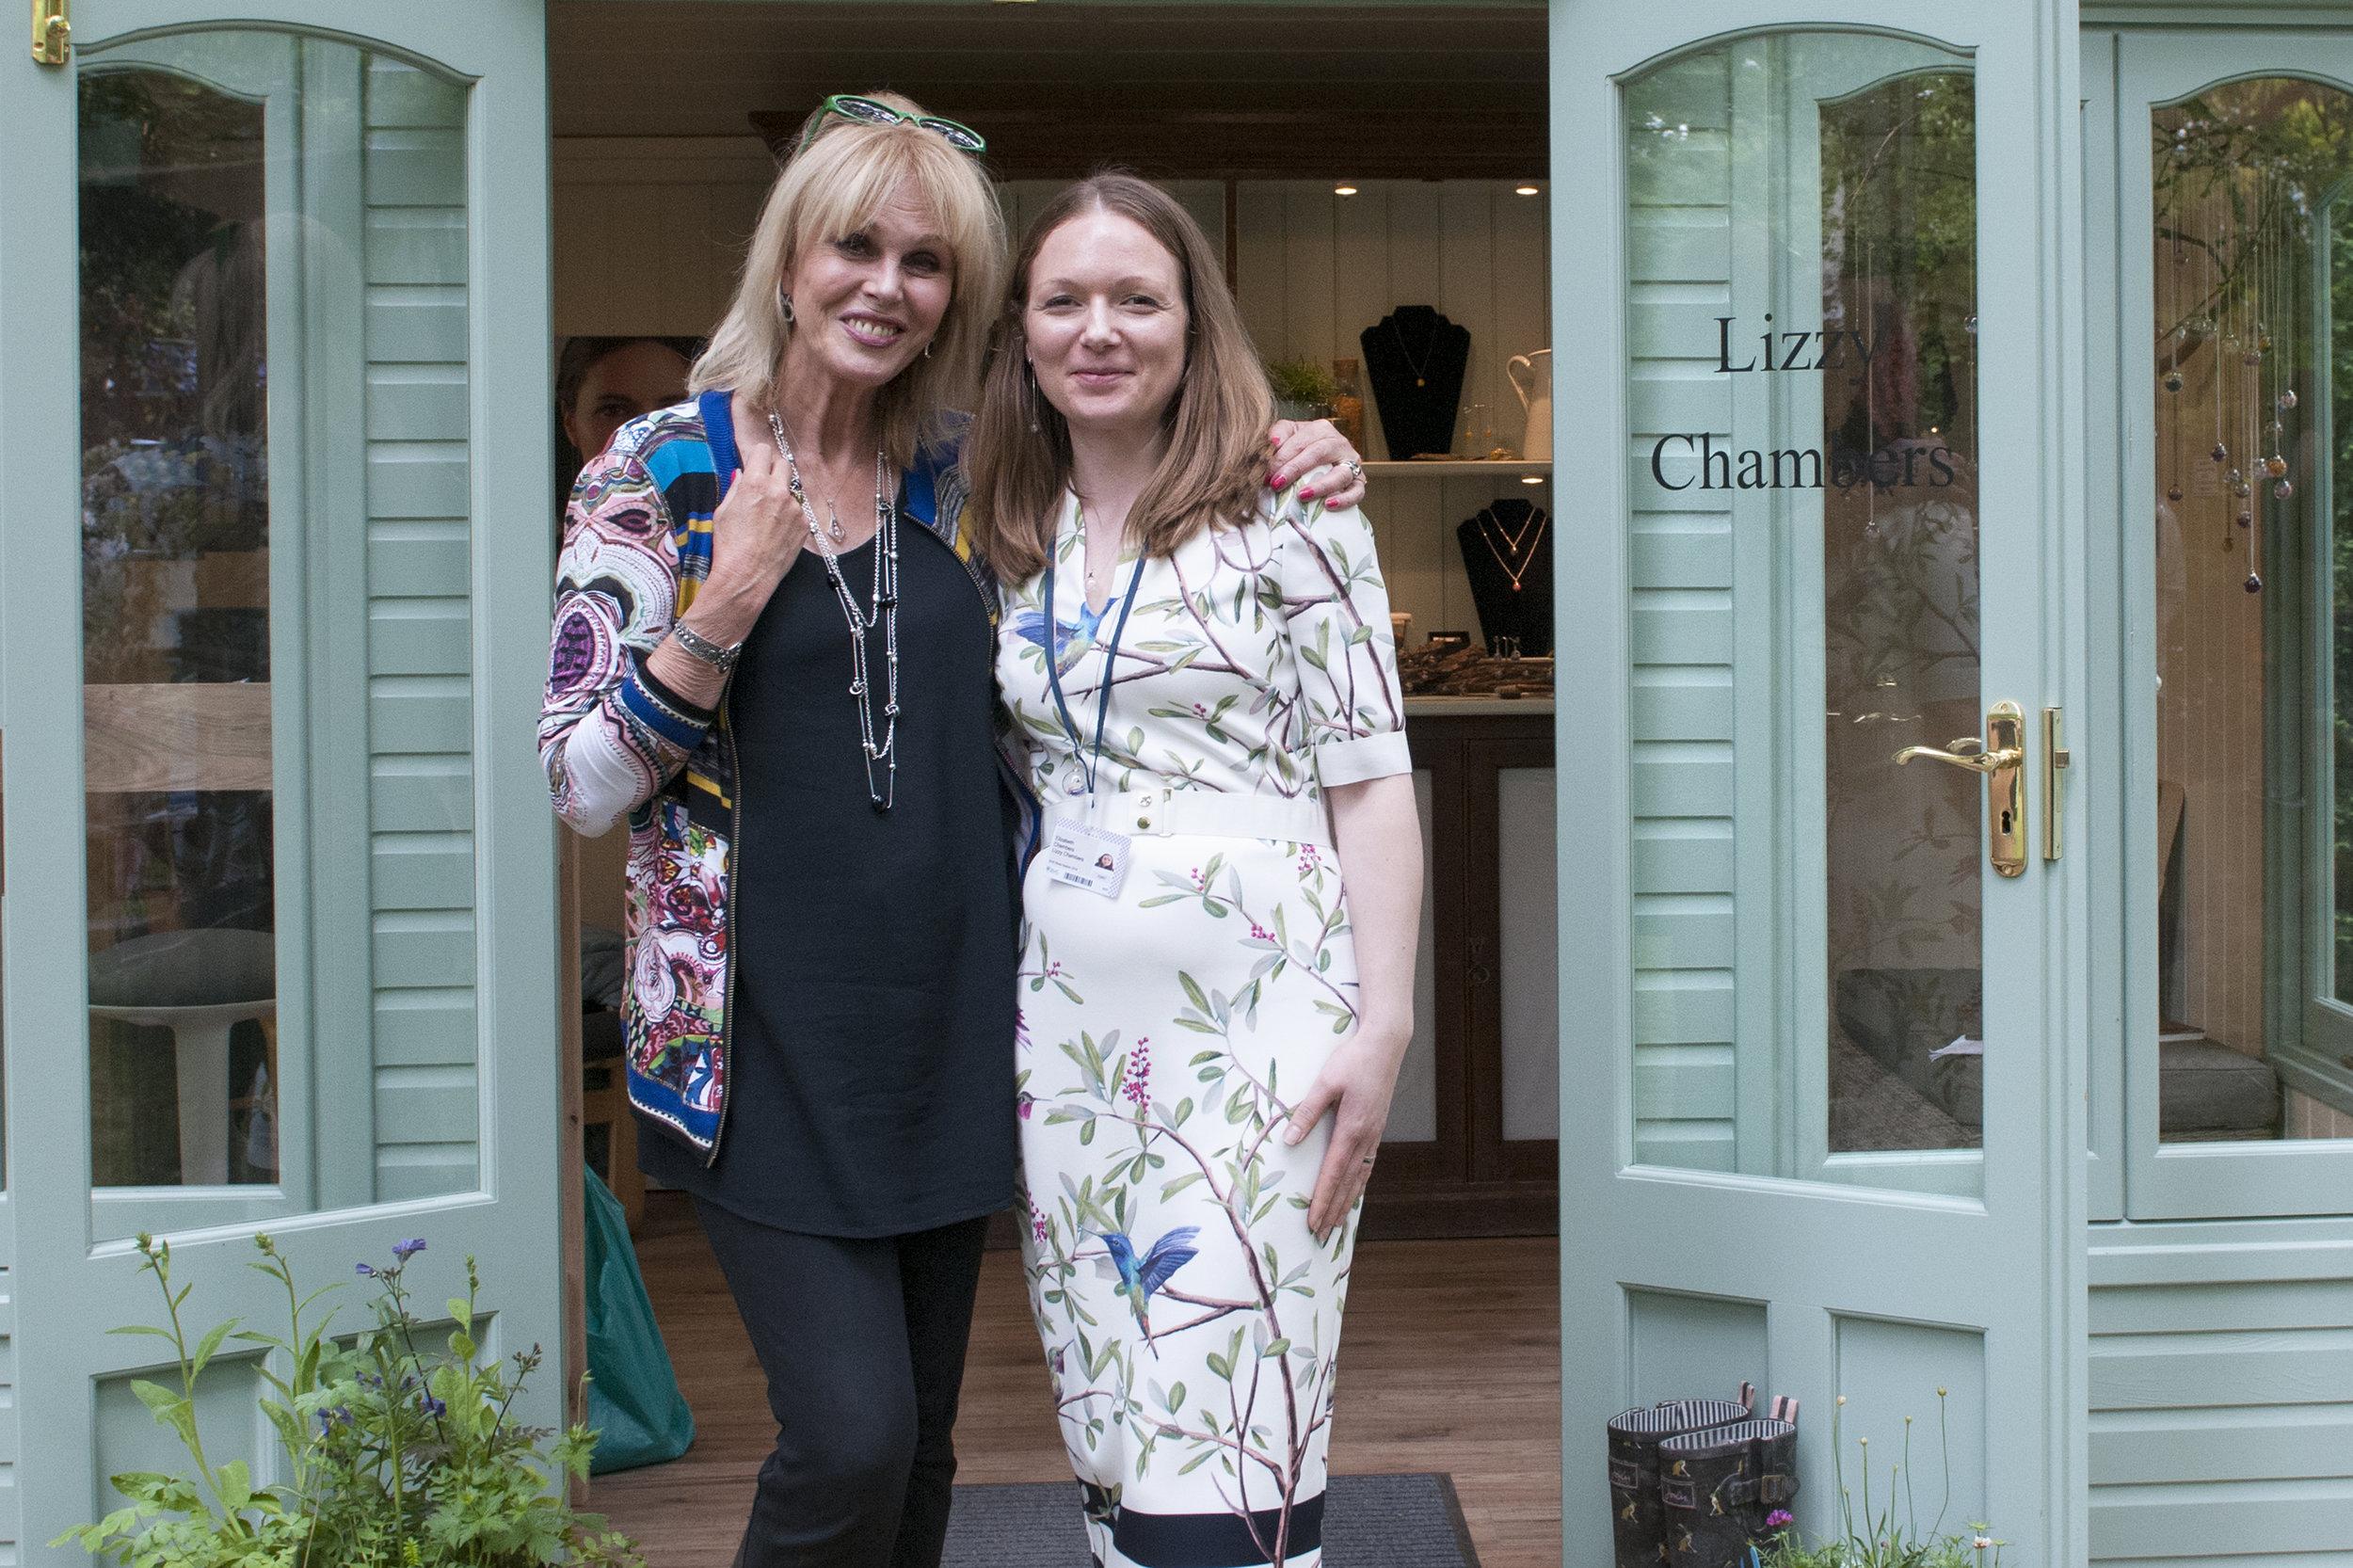 Lizzy Chambers with Joanna Lumley.jpg